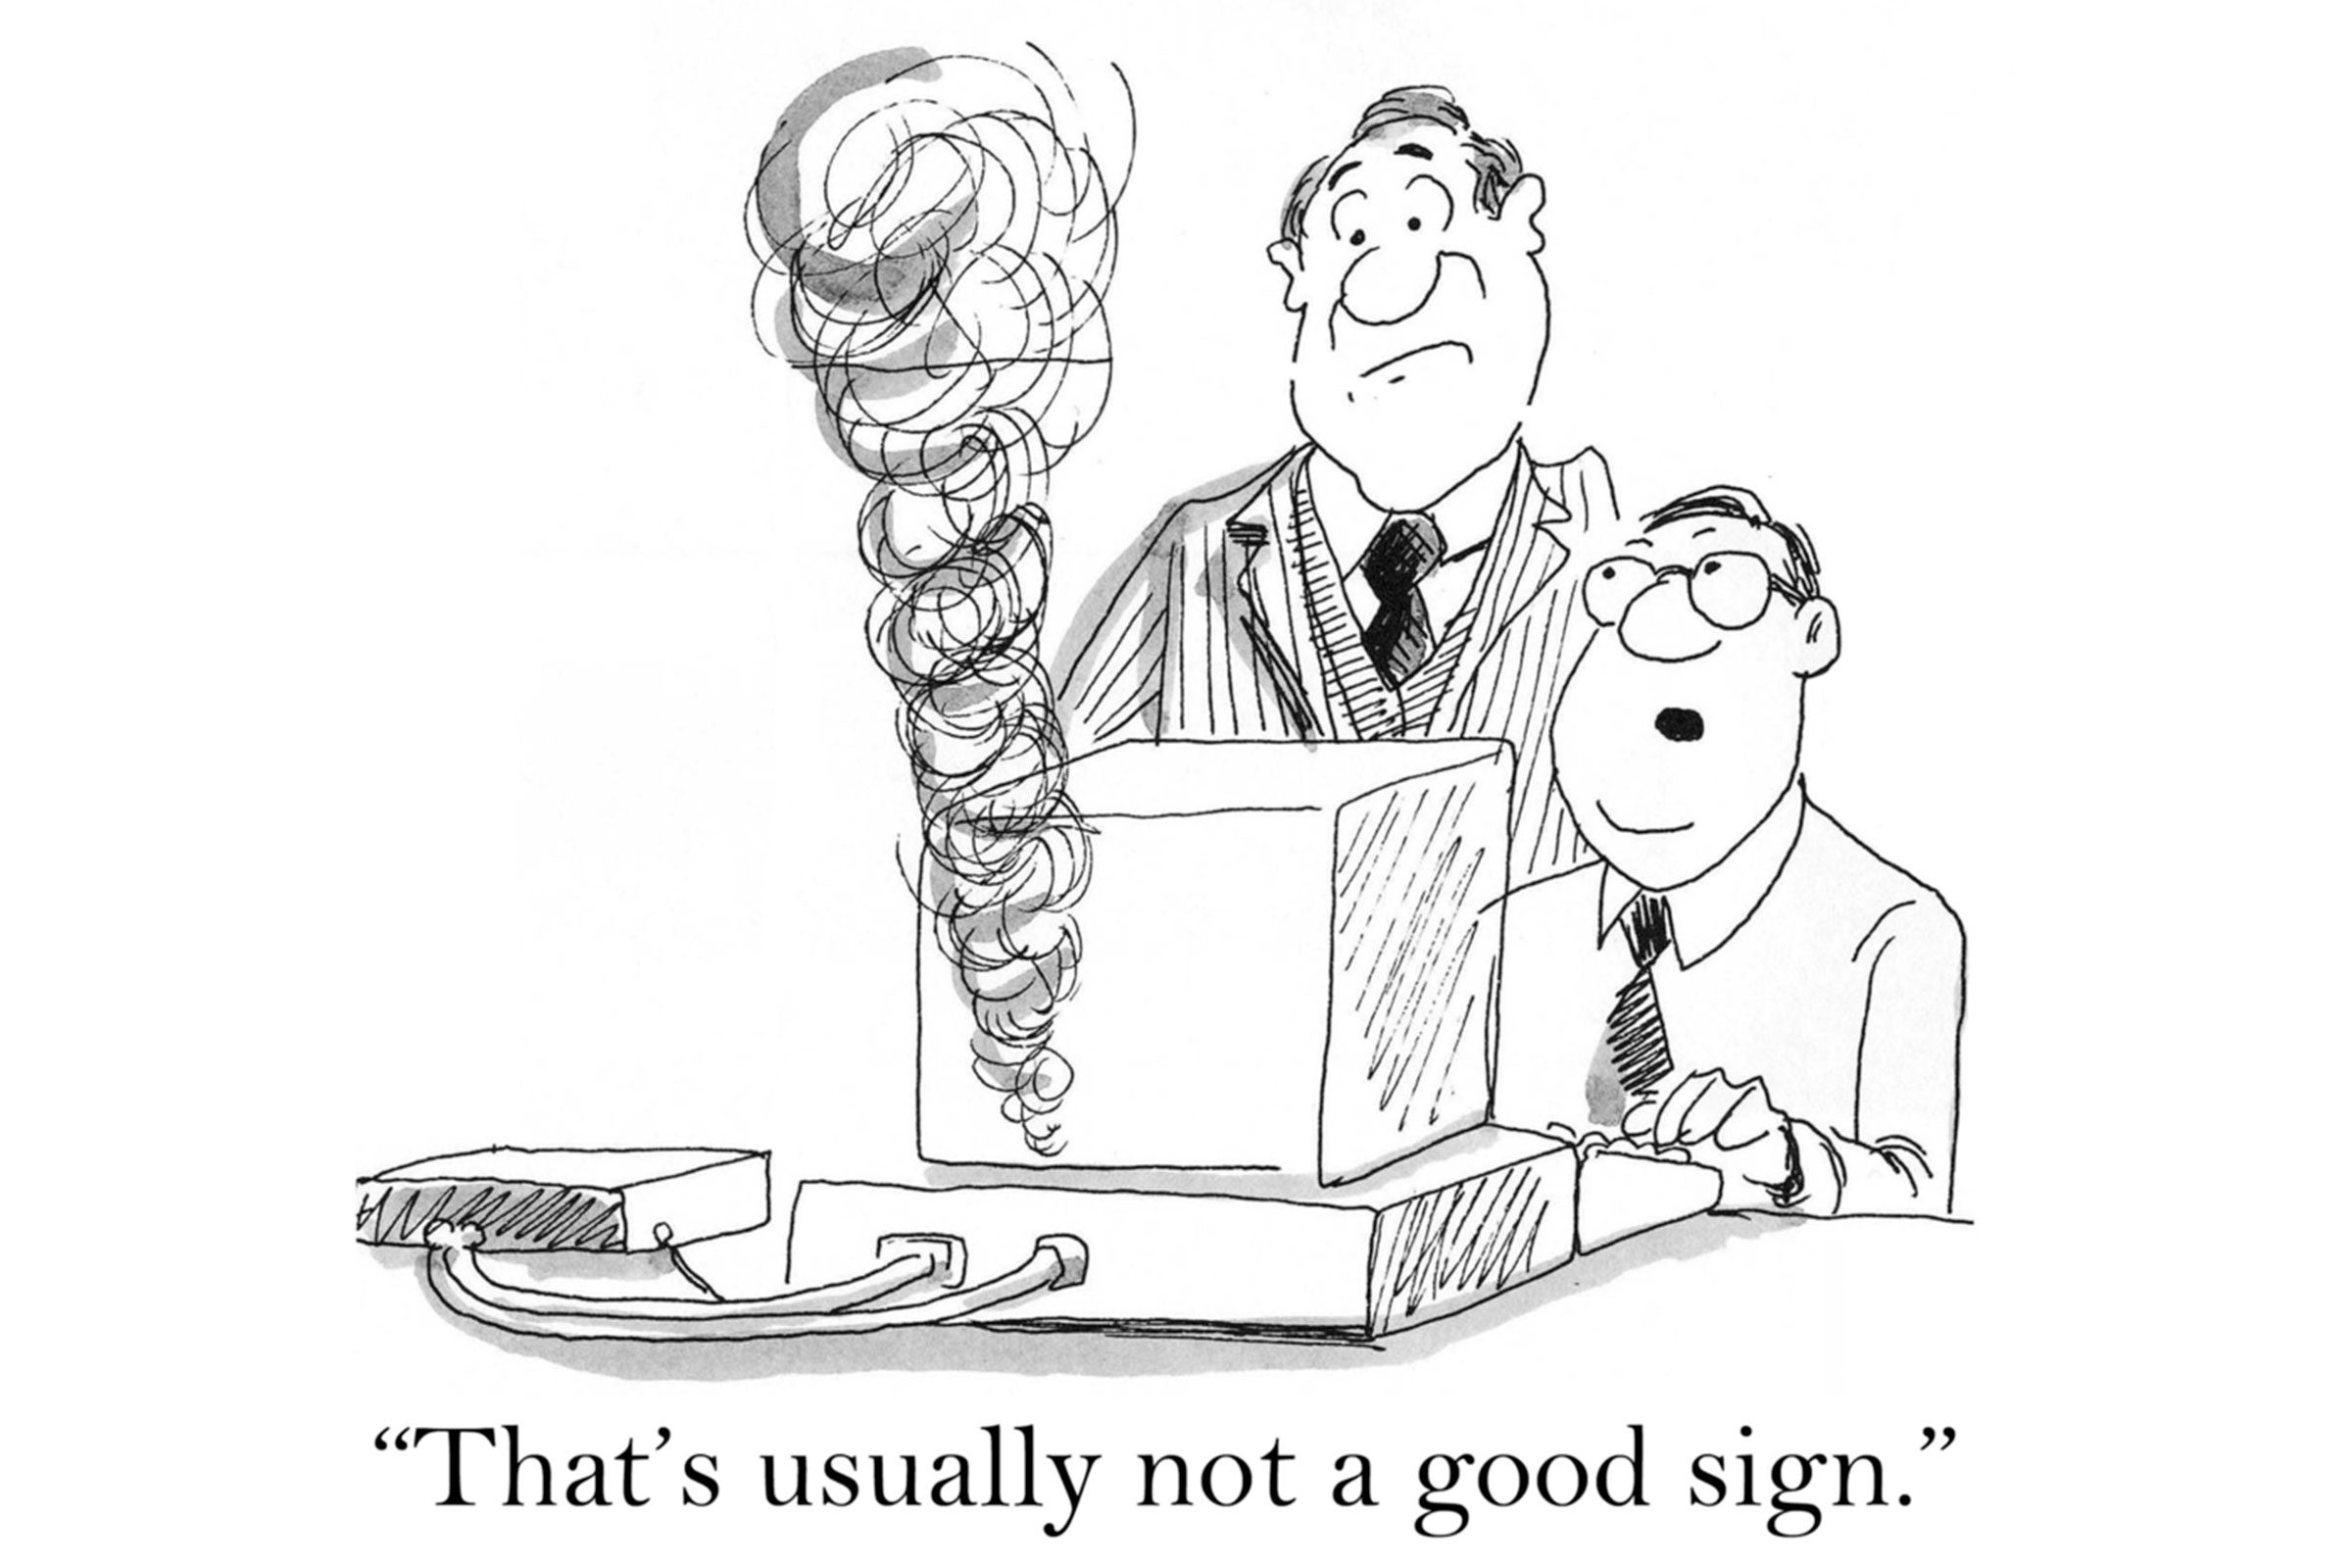 Work Cartoons to Help You Get Through the Week